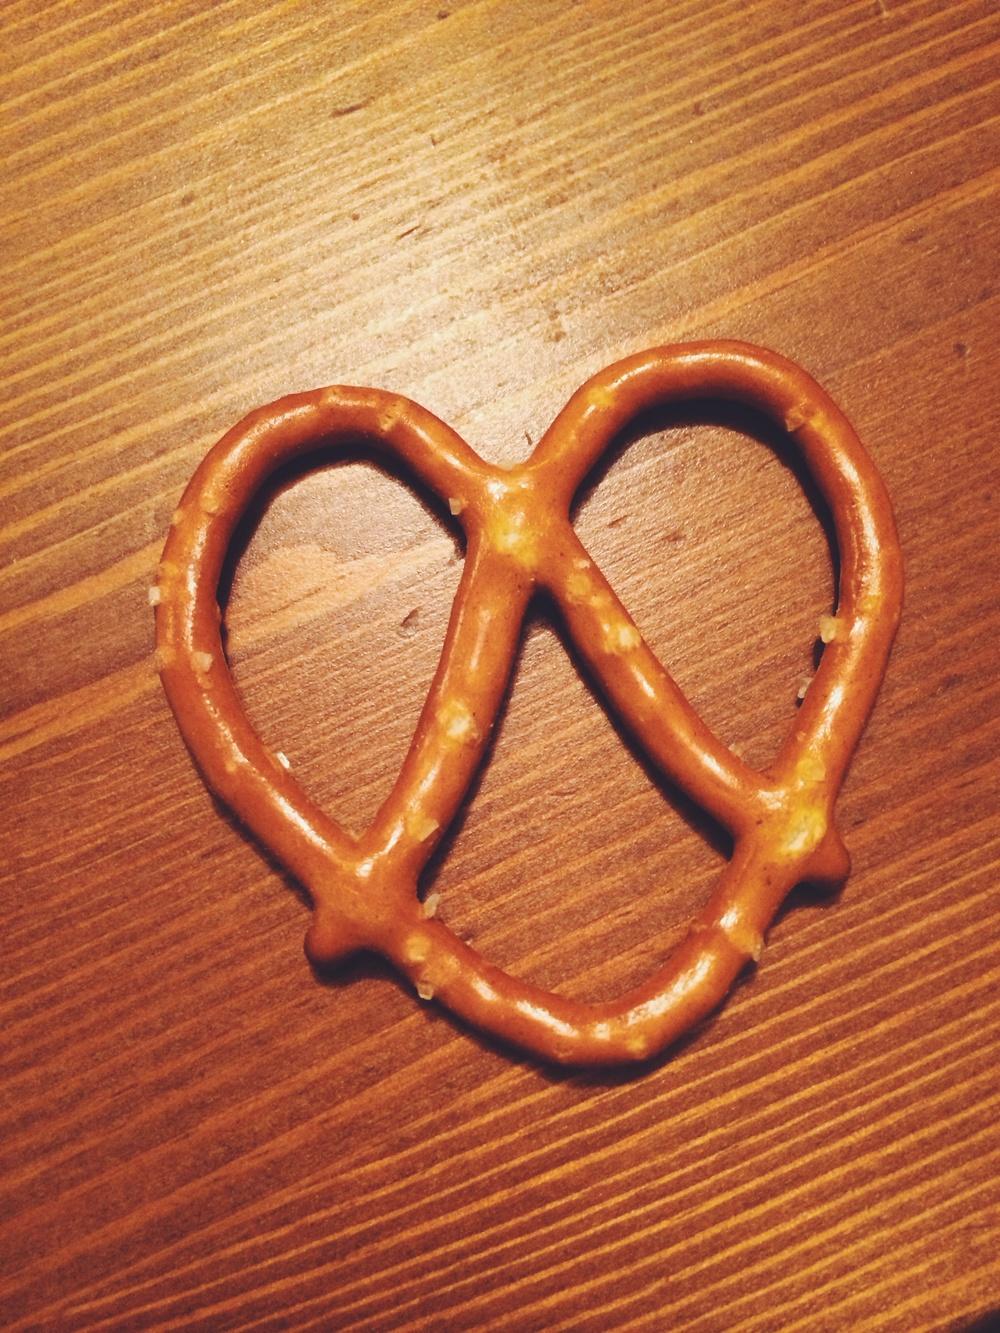 it's a love pretzel!